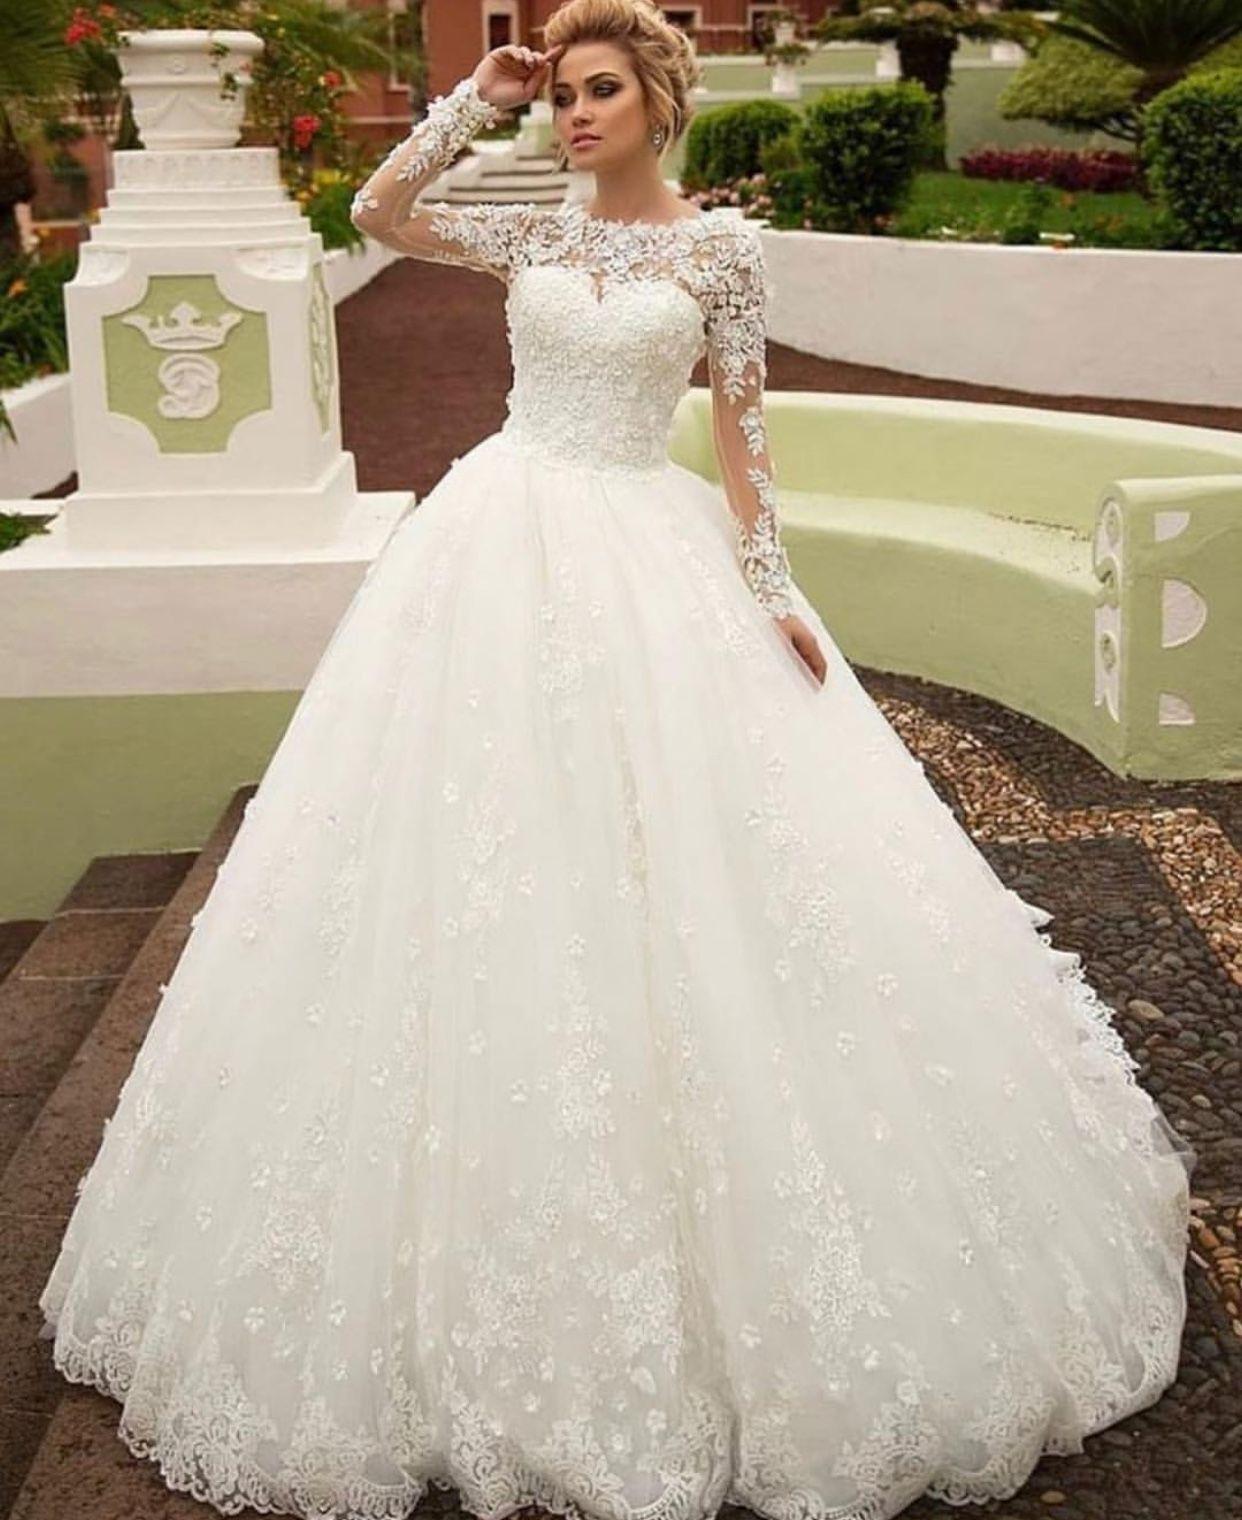 Lovely Wedding Dress Wedding Dresses Ivory Wedding Dress Ball Gowns Wedding [ 1520 x 1242 Pixel ]